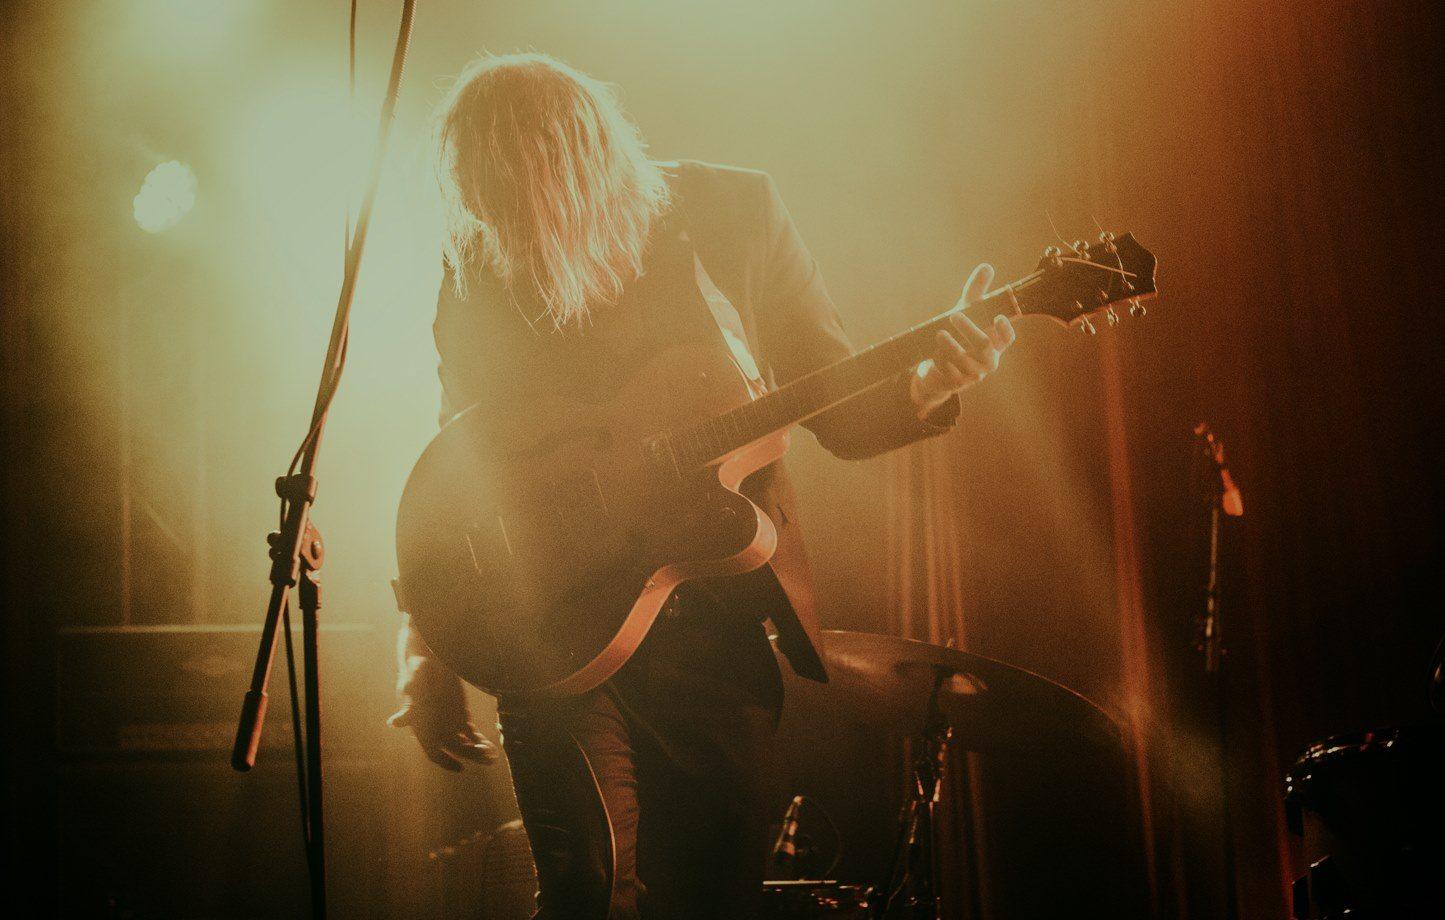 Brother Grimm live at Lido, Berlin 04.12.2016 with Coogans Bluff pic: Alexander Zirkler Photography